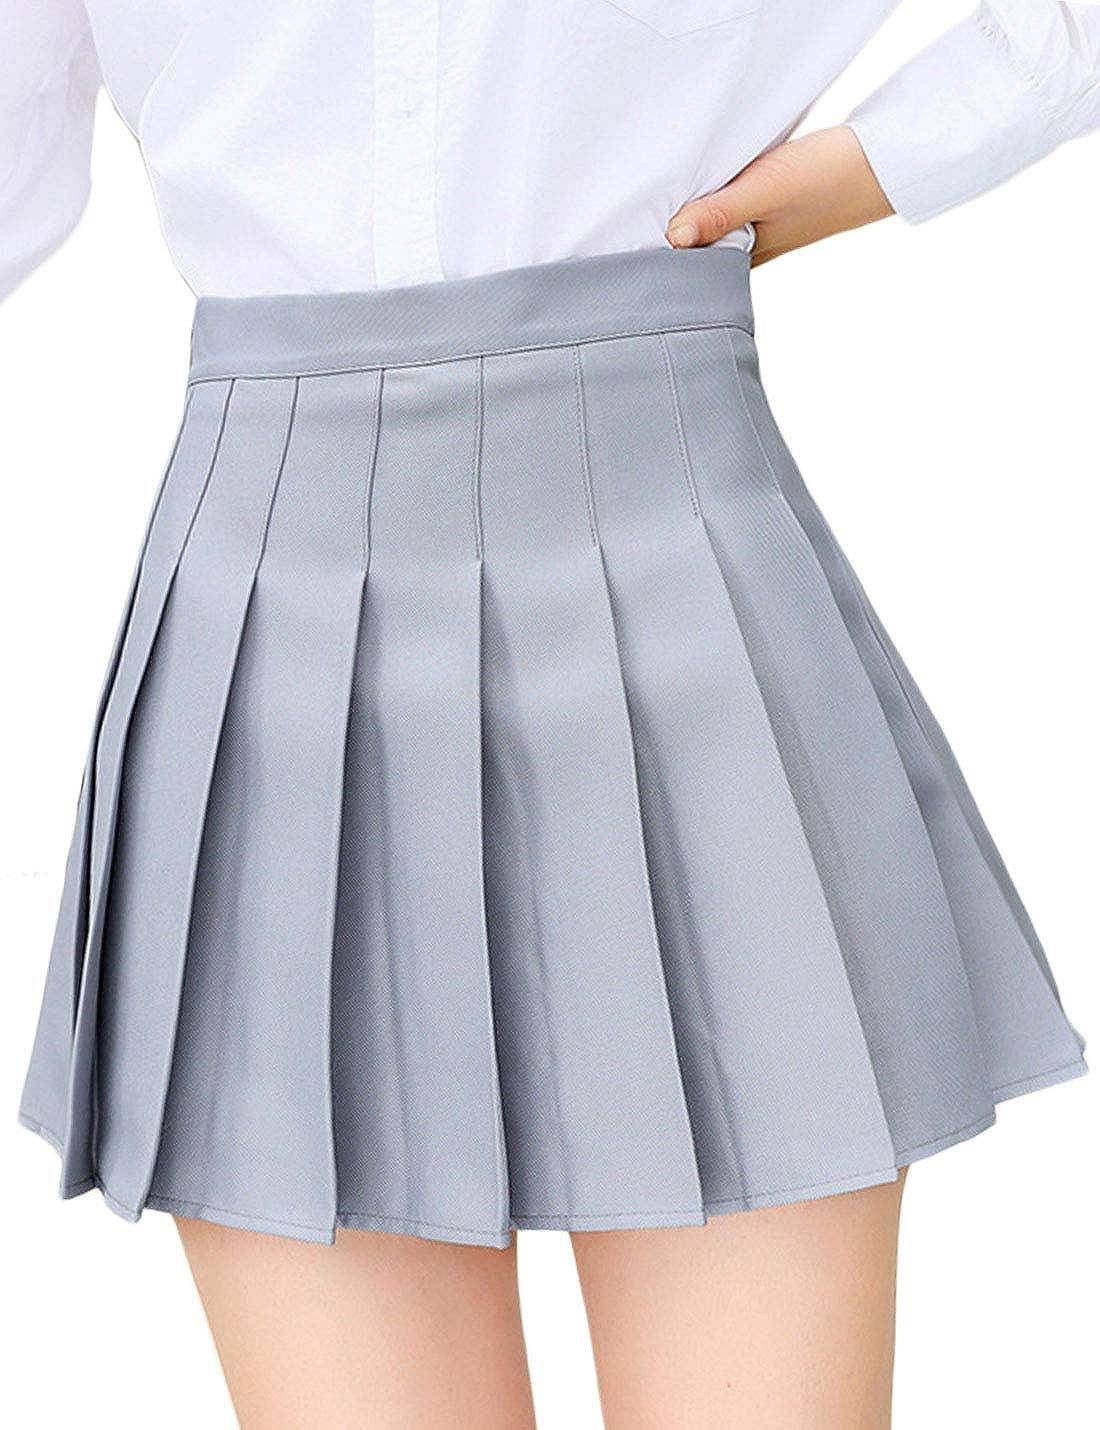 Jenkoon Womens Girls Pleated Dennis Skirt High Waist A-Line School Uniform  Skater Skirts at Amazon Women's Clothing store